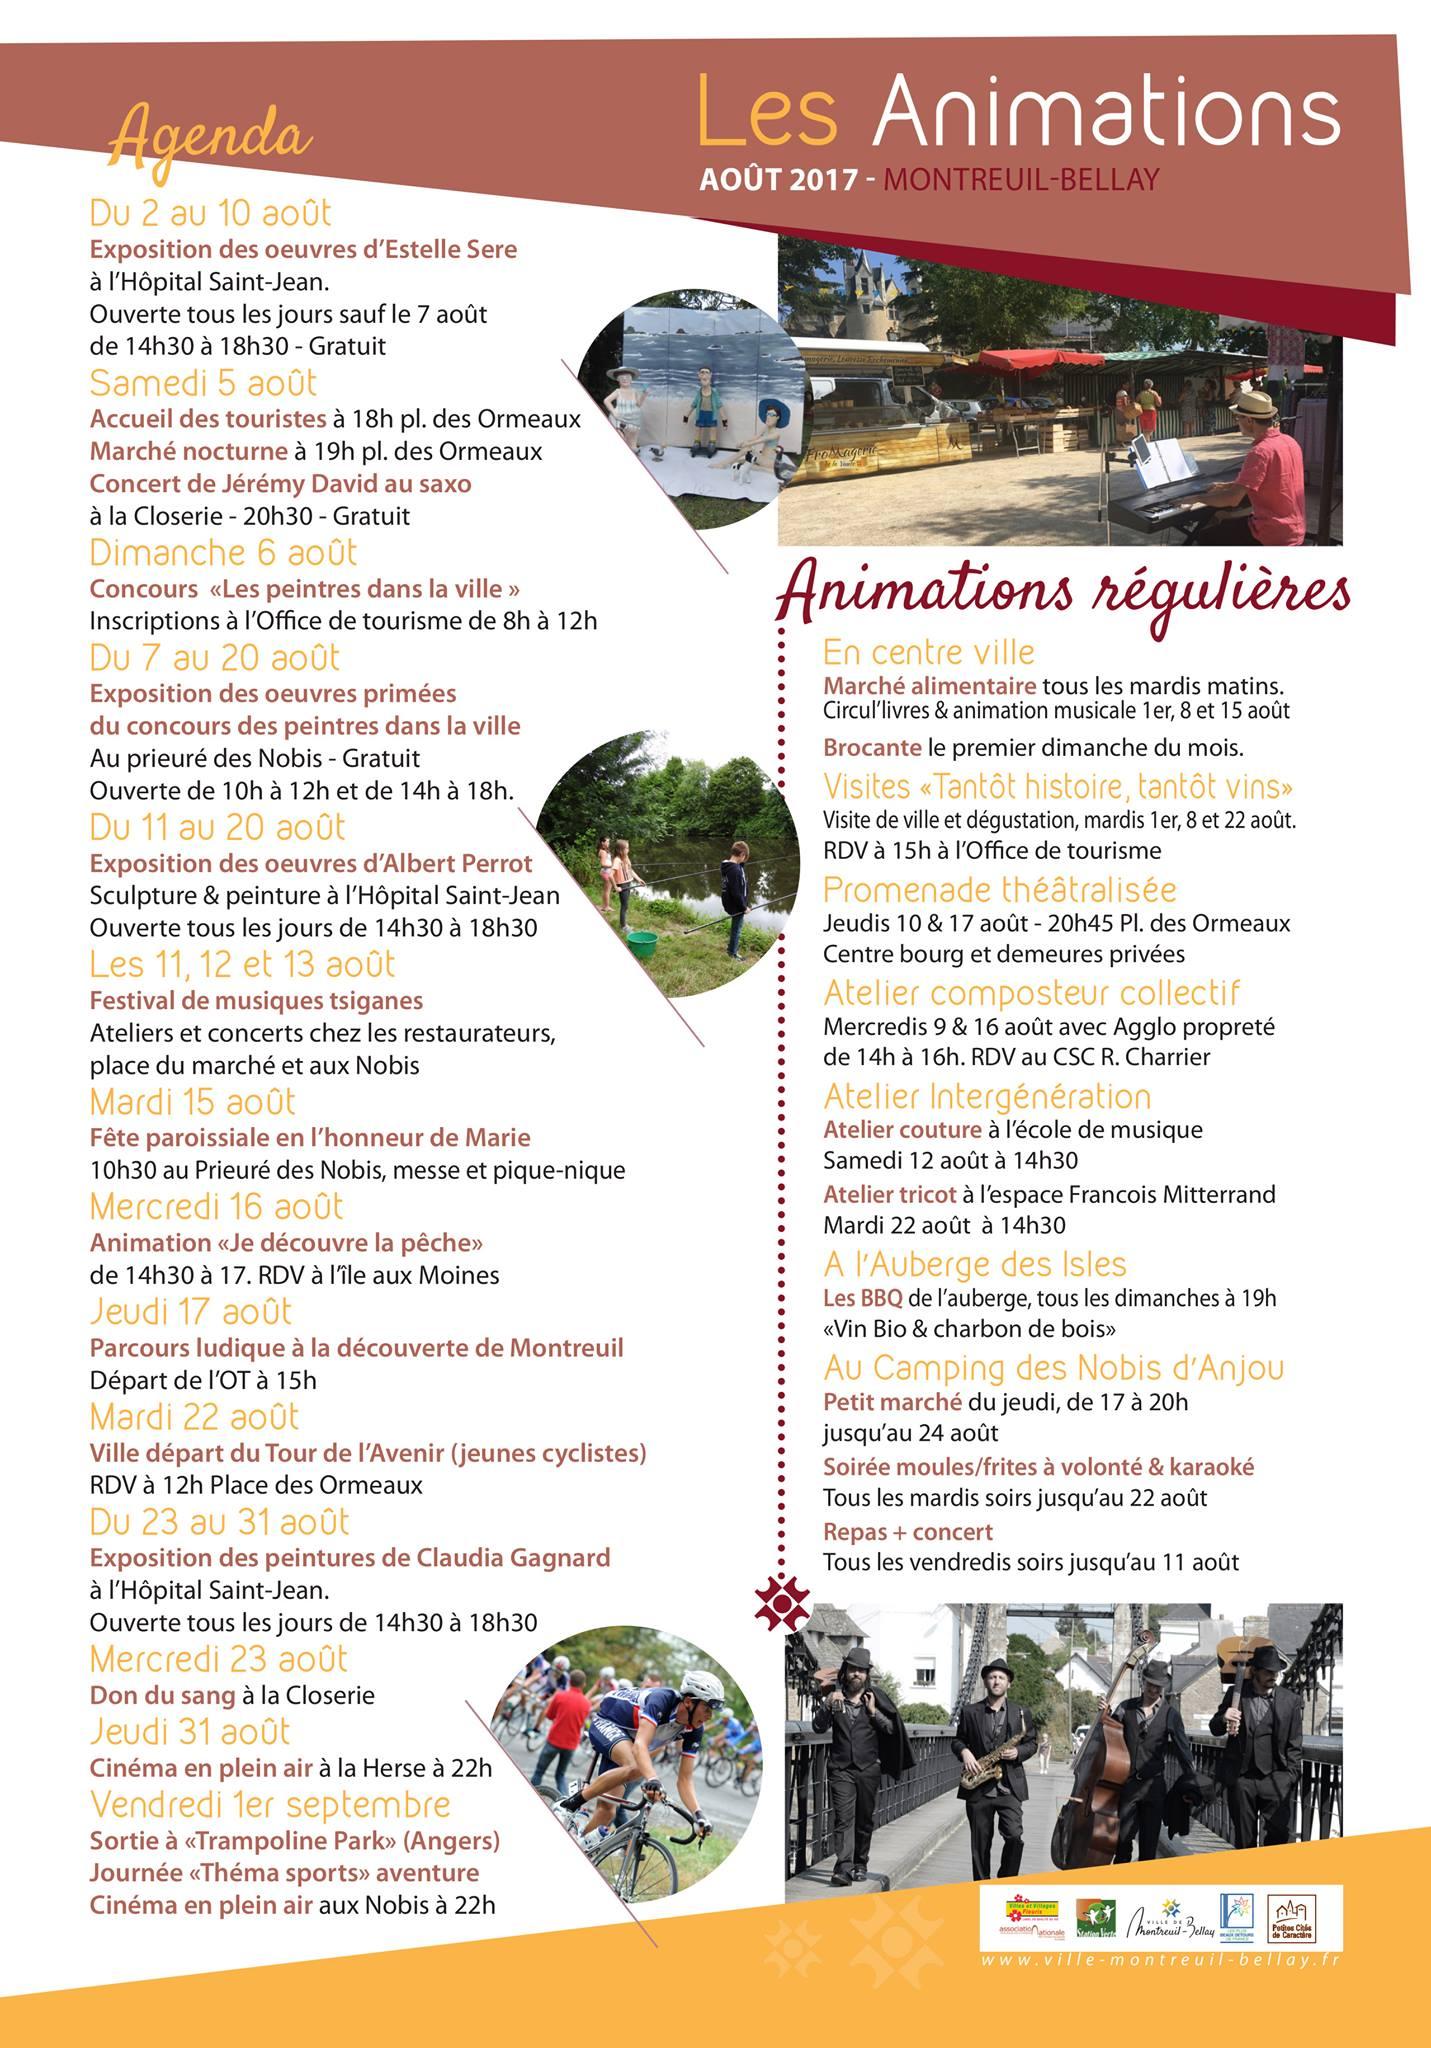 Ce mois ci montreuil bellay g te rural en anjou - Office de tourisme montreuil ...